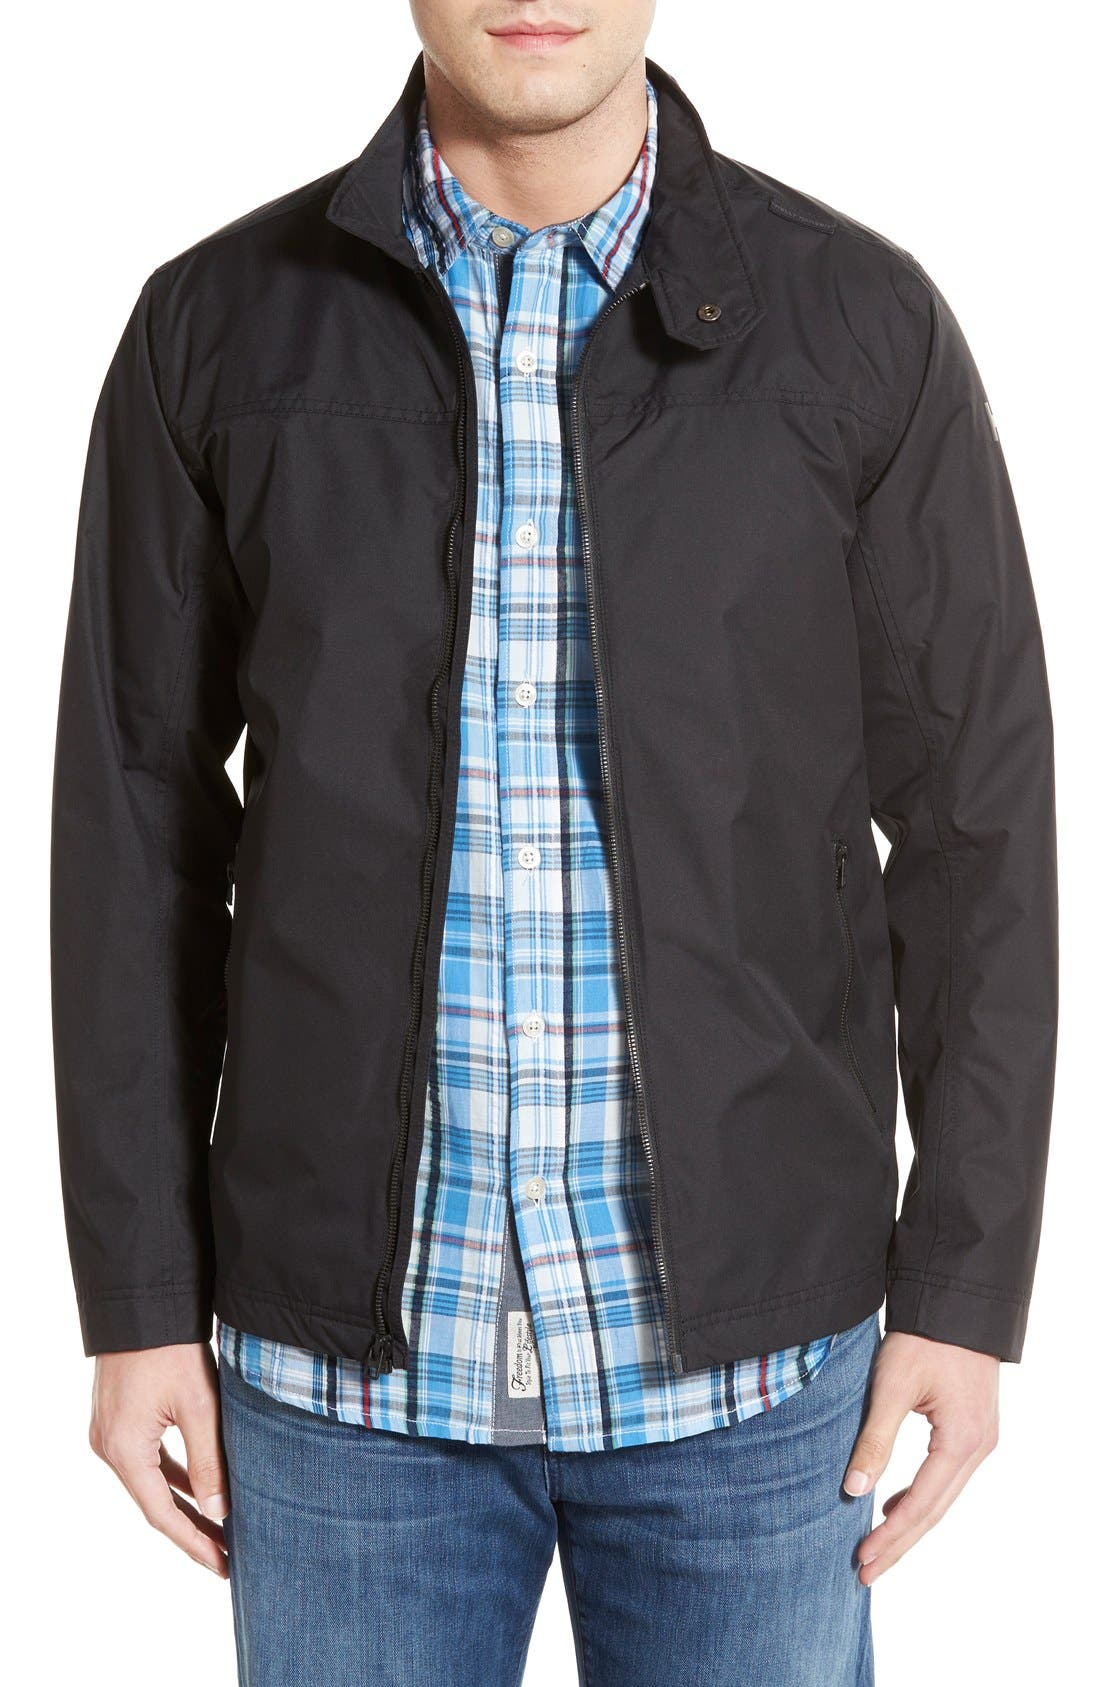 HELLY HANSEN,                             'Derry' Waterproof Jacket,                             Main thumbnail 1, color,                             009